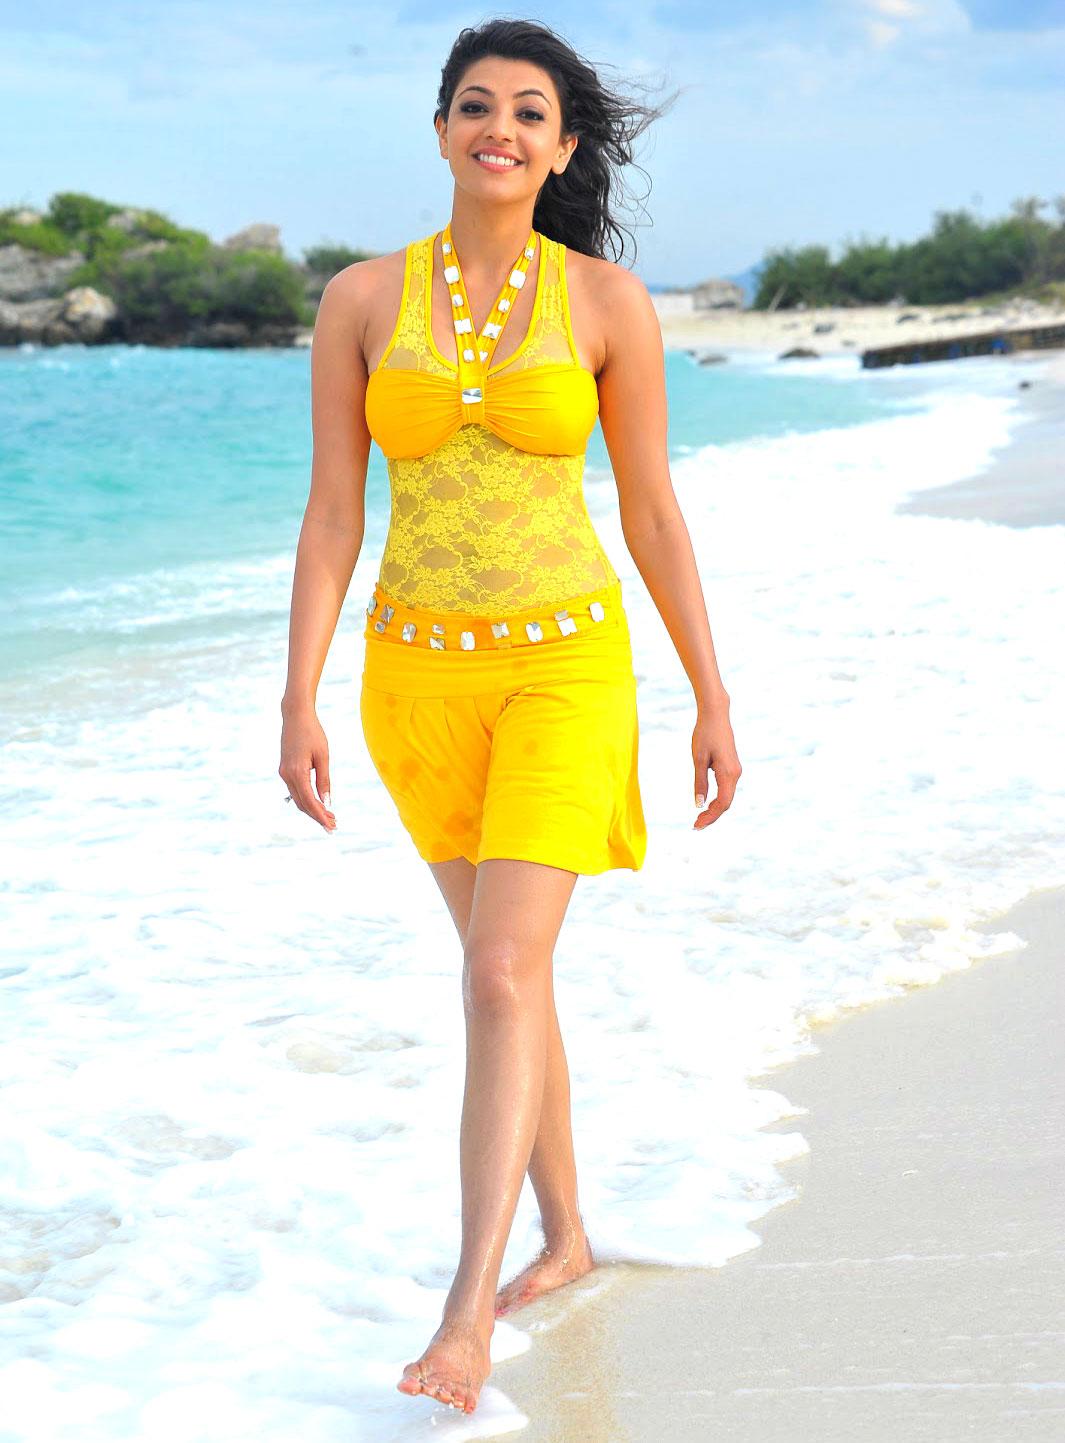 http://1.bp.blogspot.com/-6nRSrlJD07E/T0oyhSfwdgI/AAAAAAAAFL0/HM-Msxkuwqk/s1600/kajal-agarwal-yellow-dress49885858.jpg